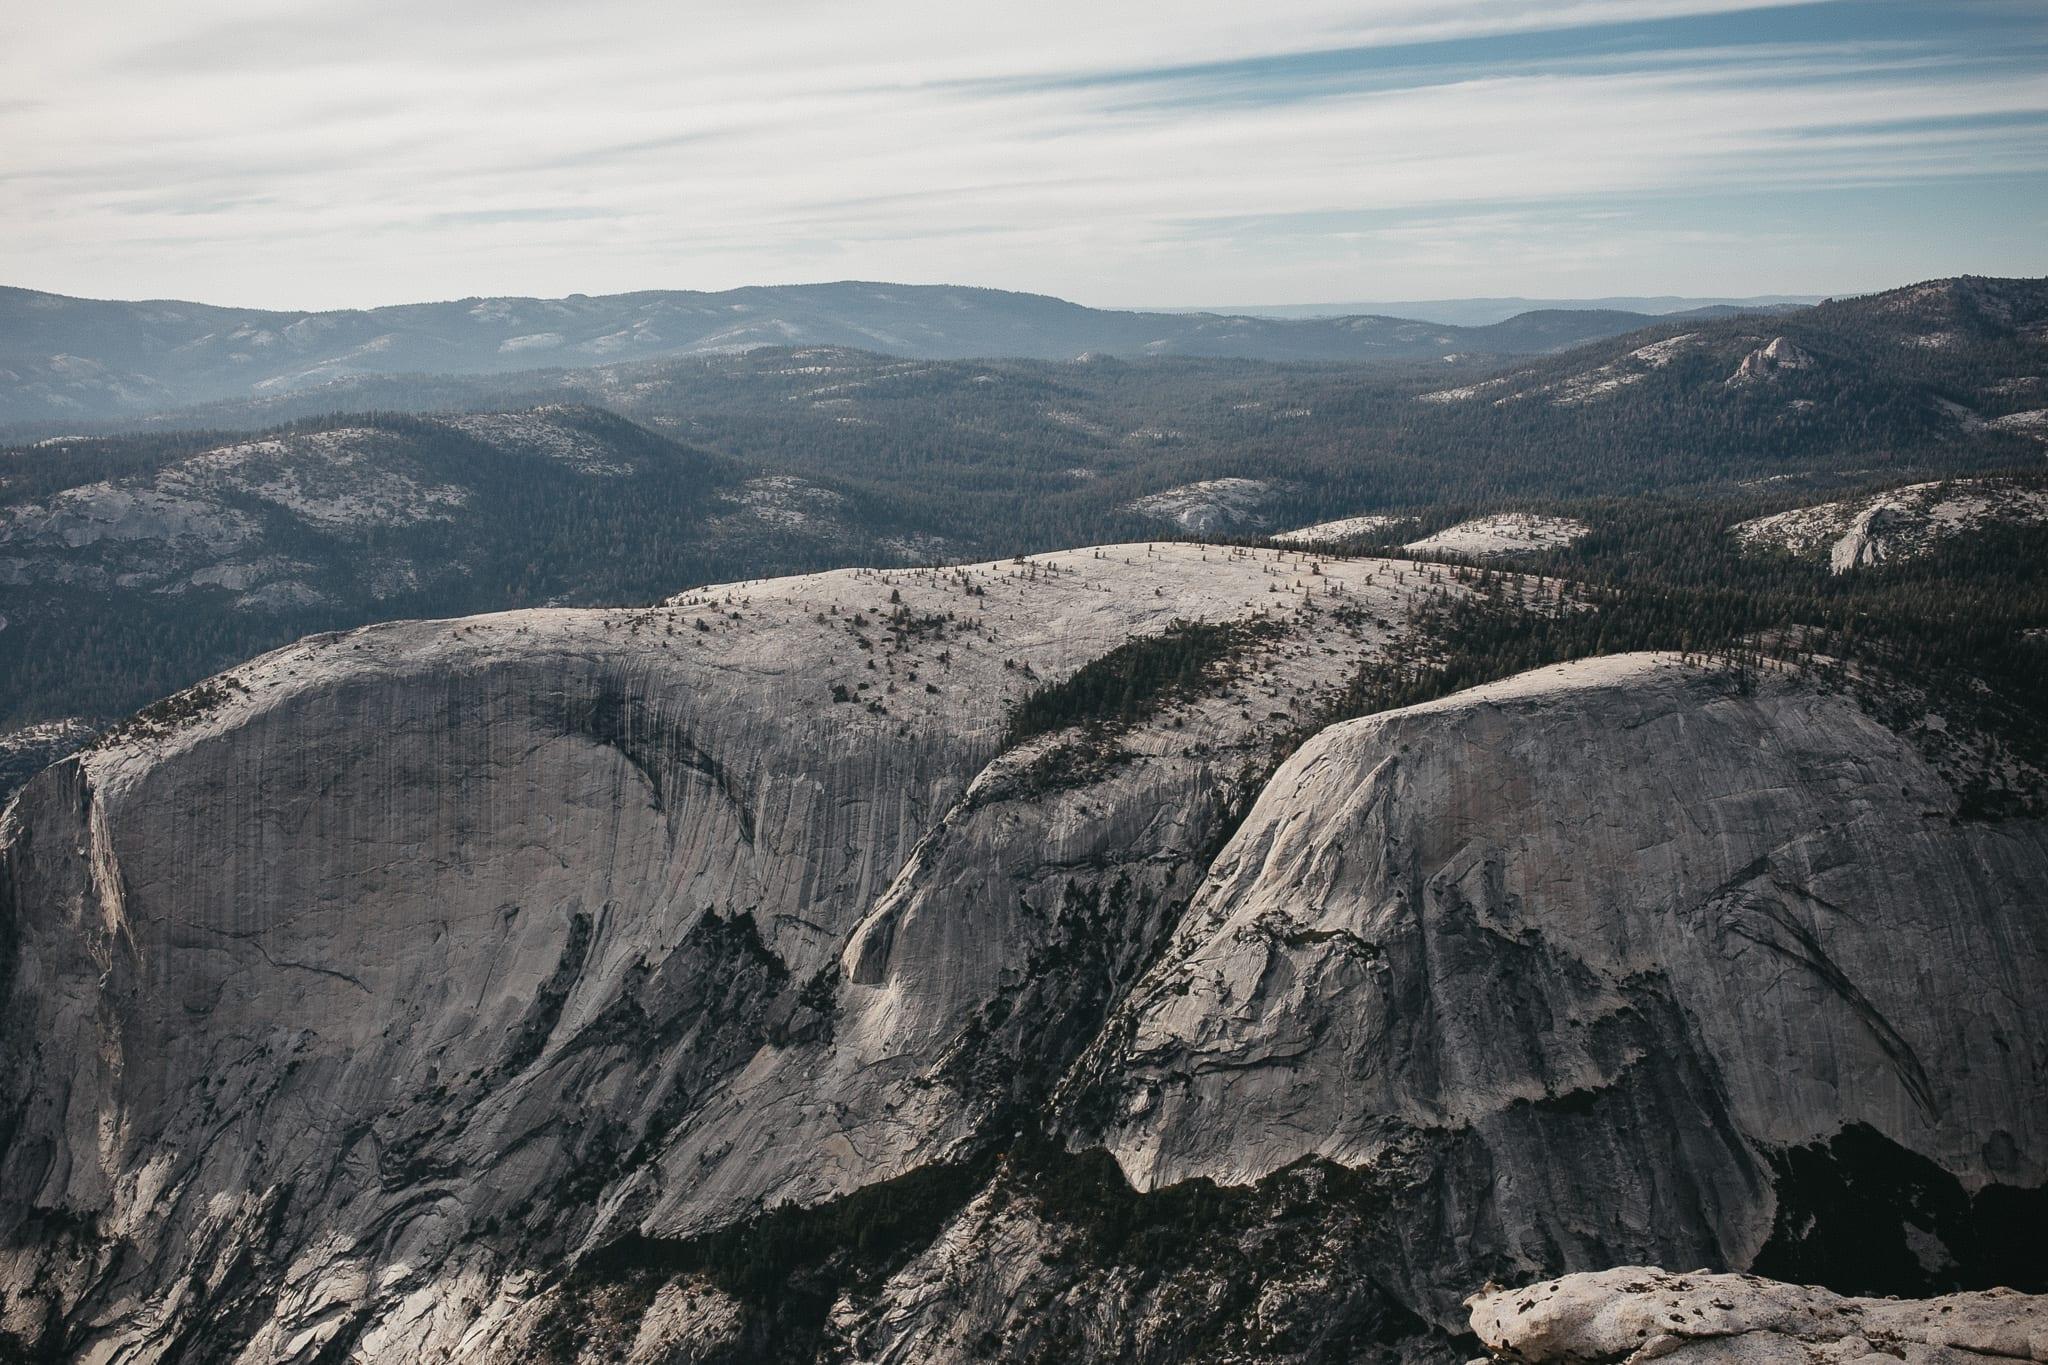 clouds-rest-yosemite-california-engagement-lifestyle-adventure-photographer-29